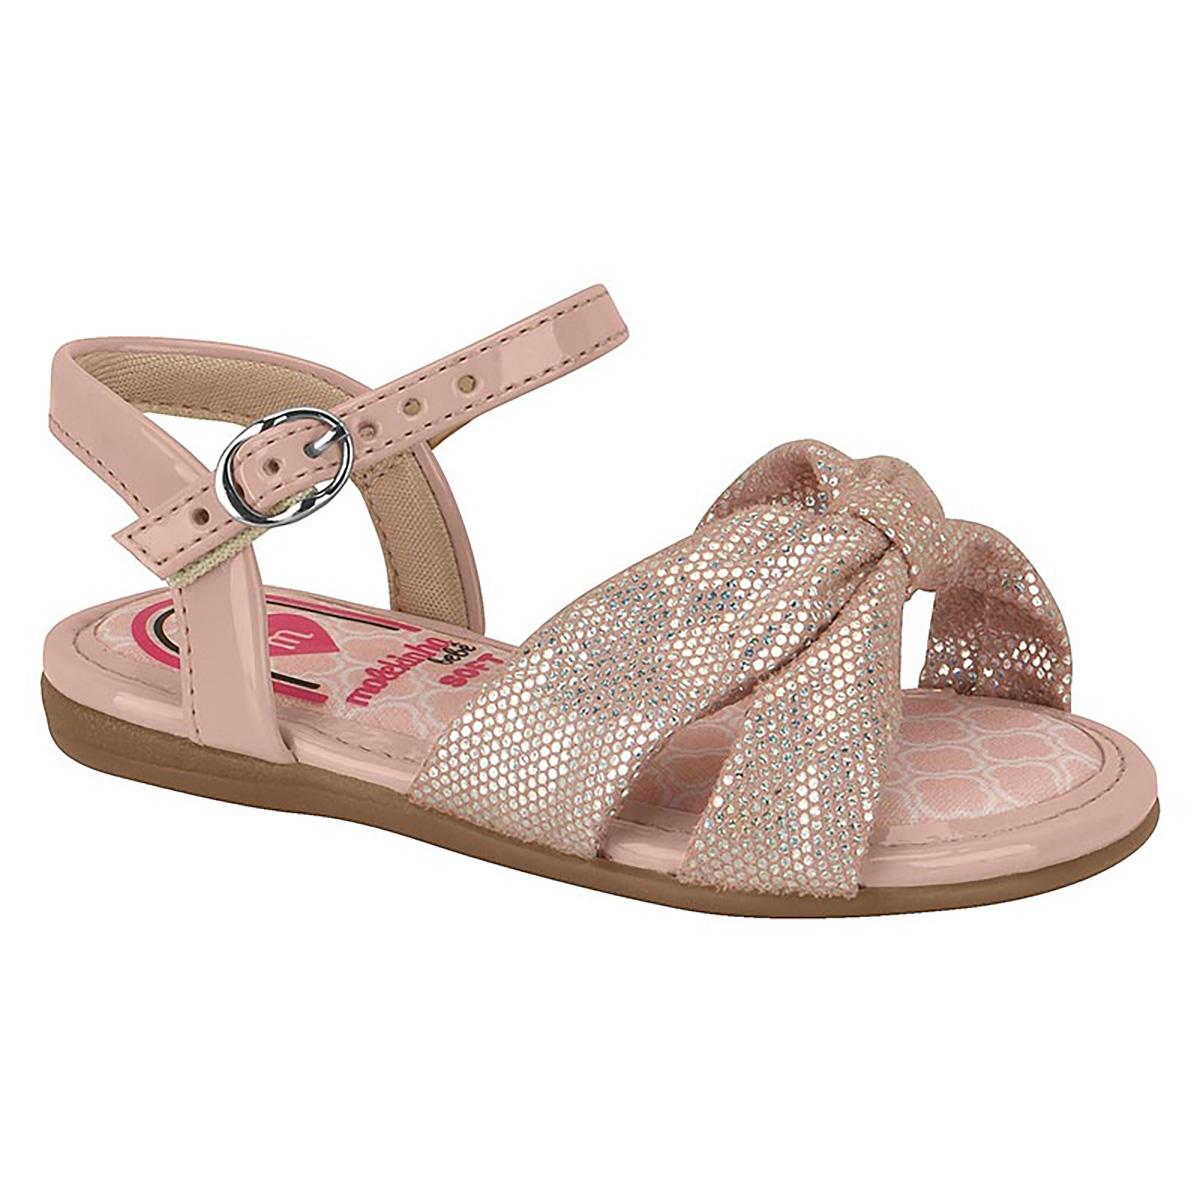 Sandalia Molekinha Feminina Diamantes Premium